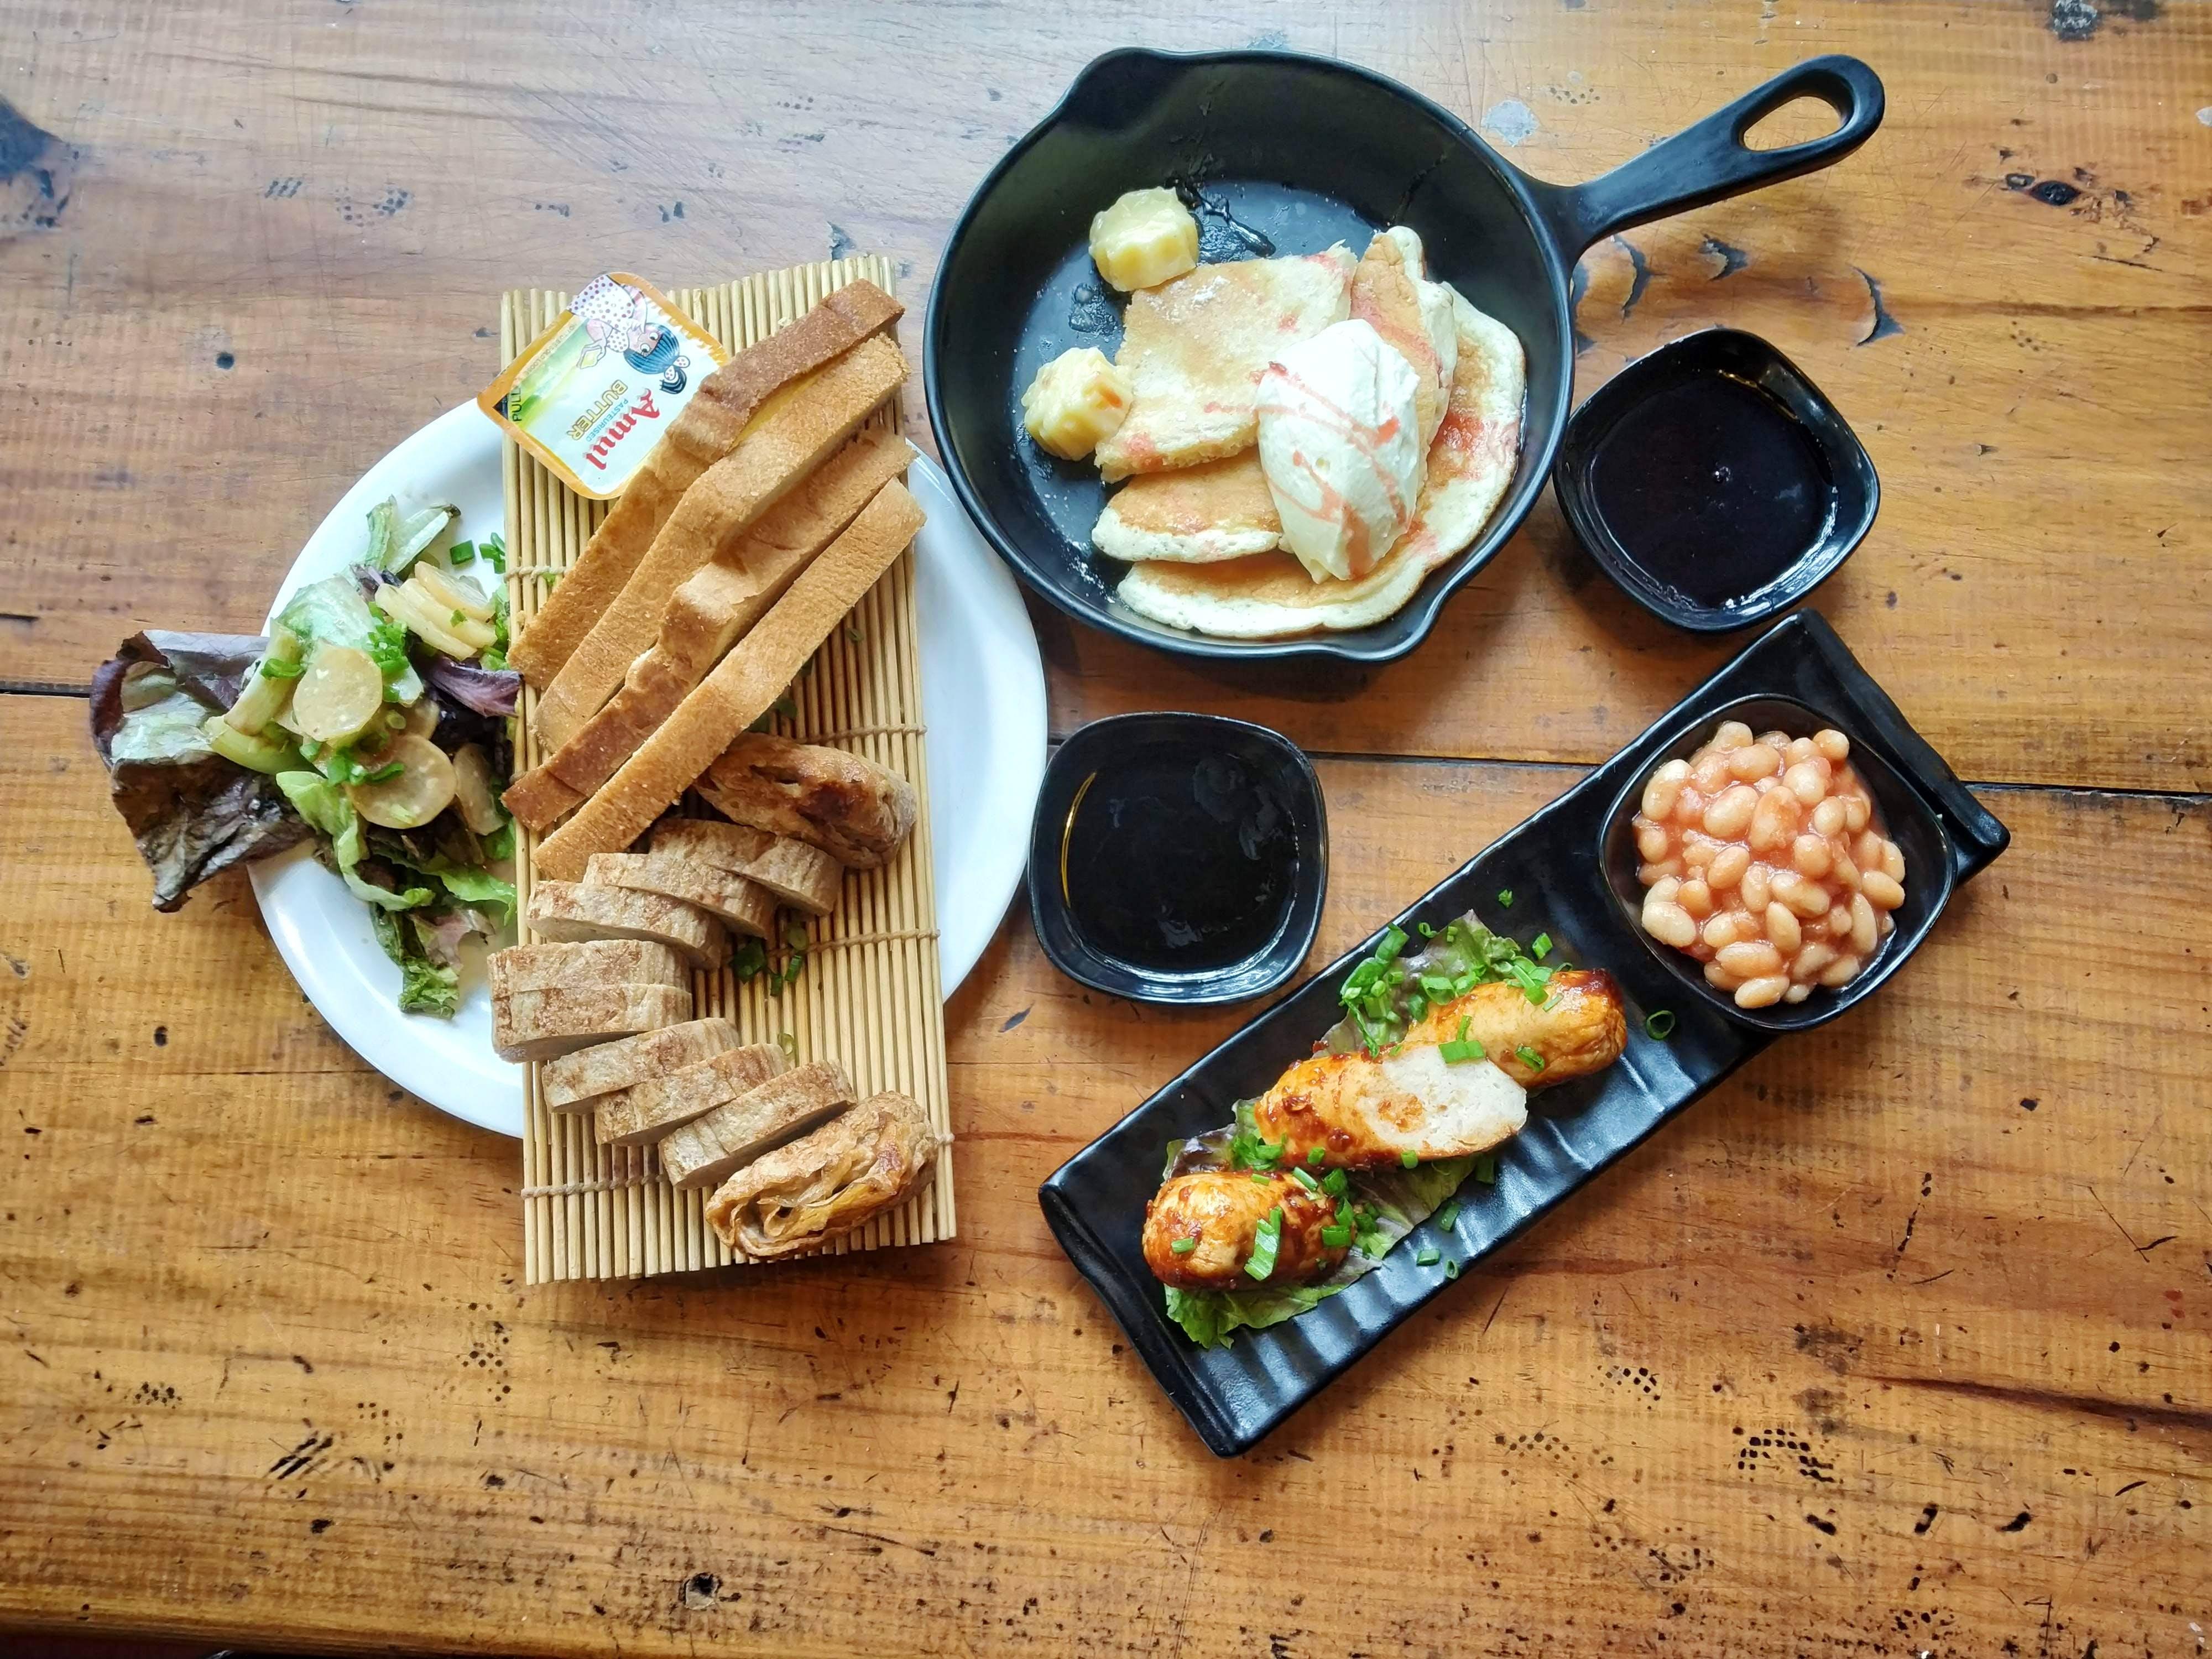 Dish,Food,Cuisine,Ingredient,Meal,Brunch,Lunch,Breakfast,Comfort food,Produce